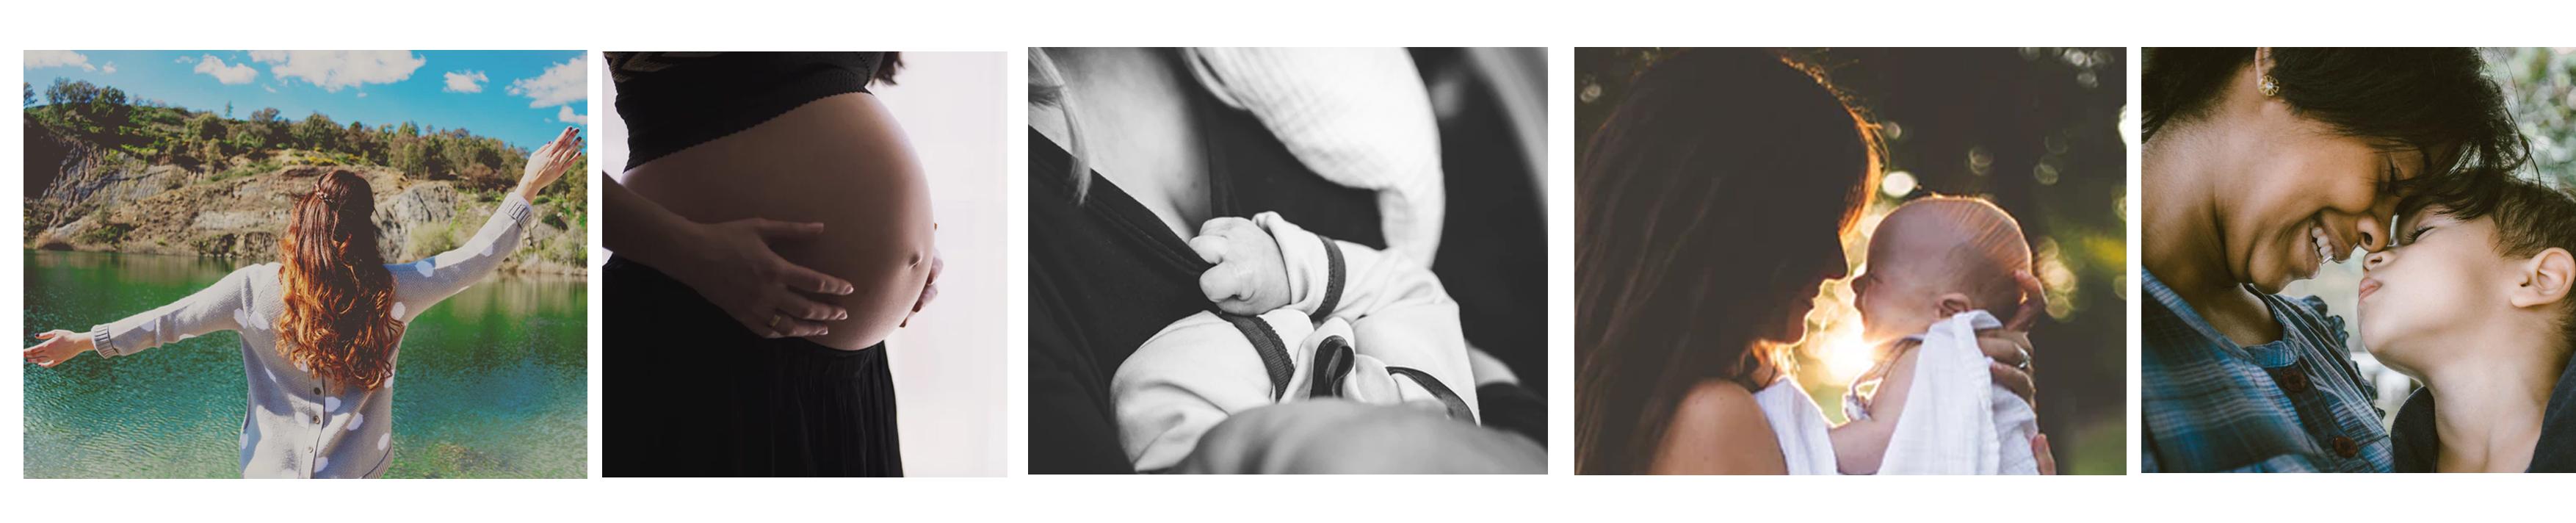 maternidadtiraetapas.jpg